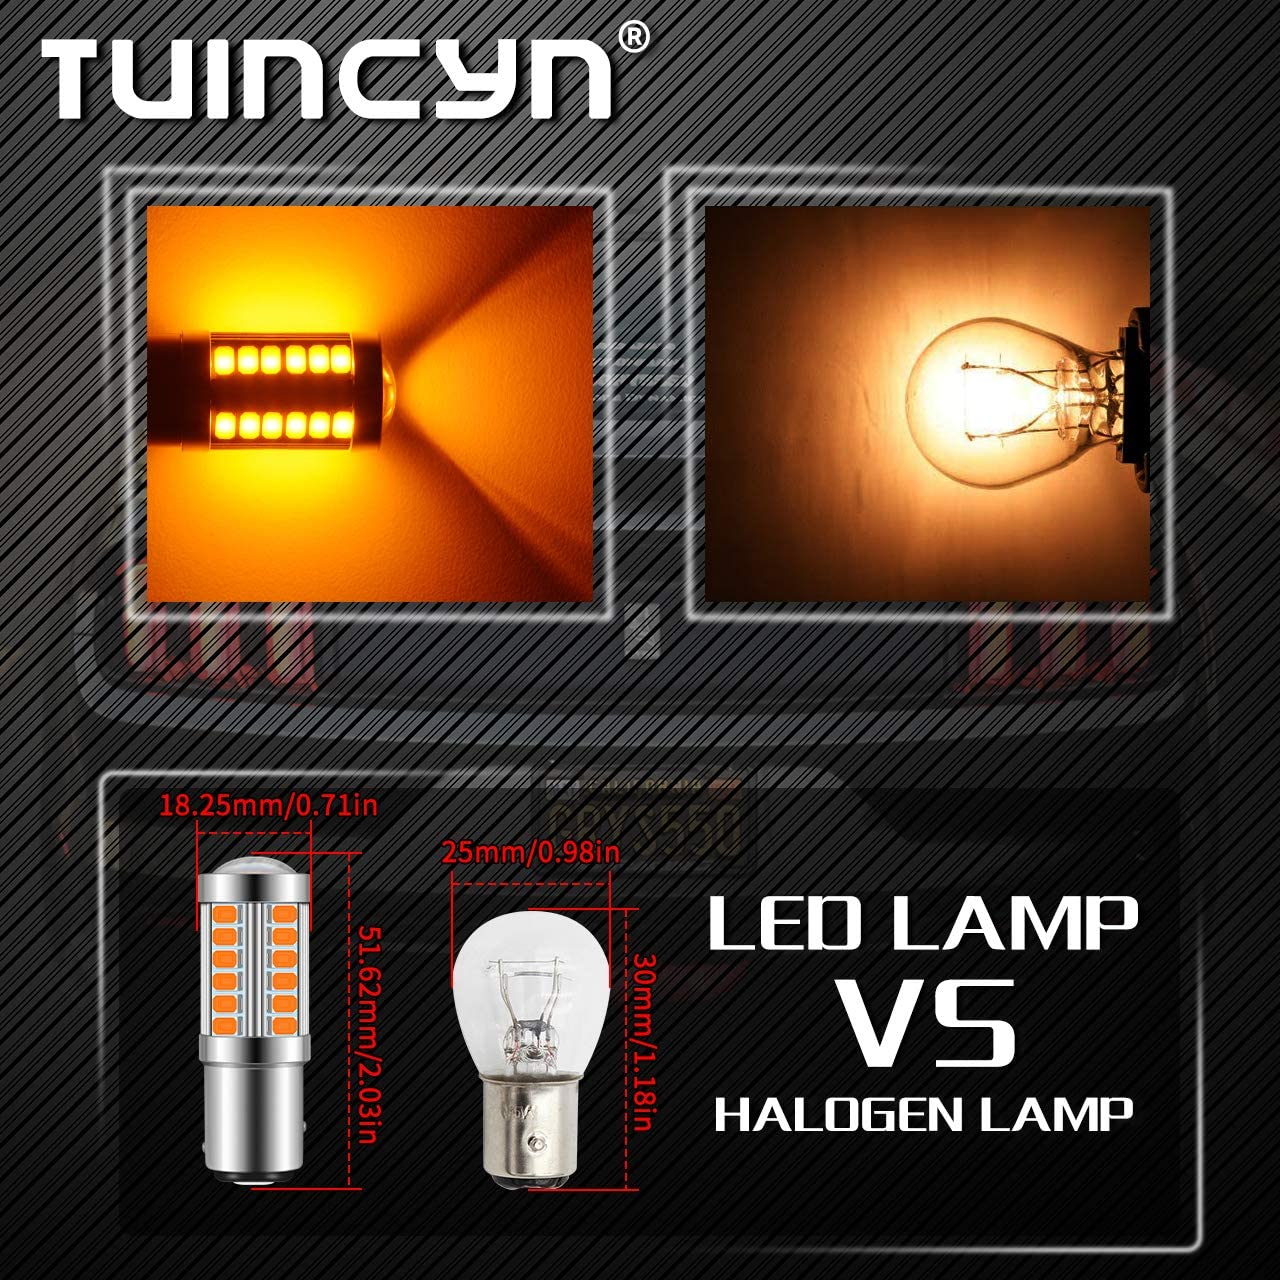 TUINCYN 1157 BAY15D LED Bulb Amber Yellow Turn Signal Light Bulb Super Bright 8000K 5630 33SMD 1016 1034 7528 2057 Tail Brake Light Back Up Reverse Light Parking Light DC 12V Pack of 2